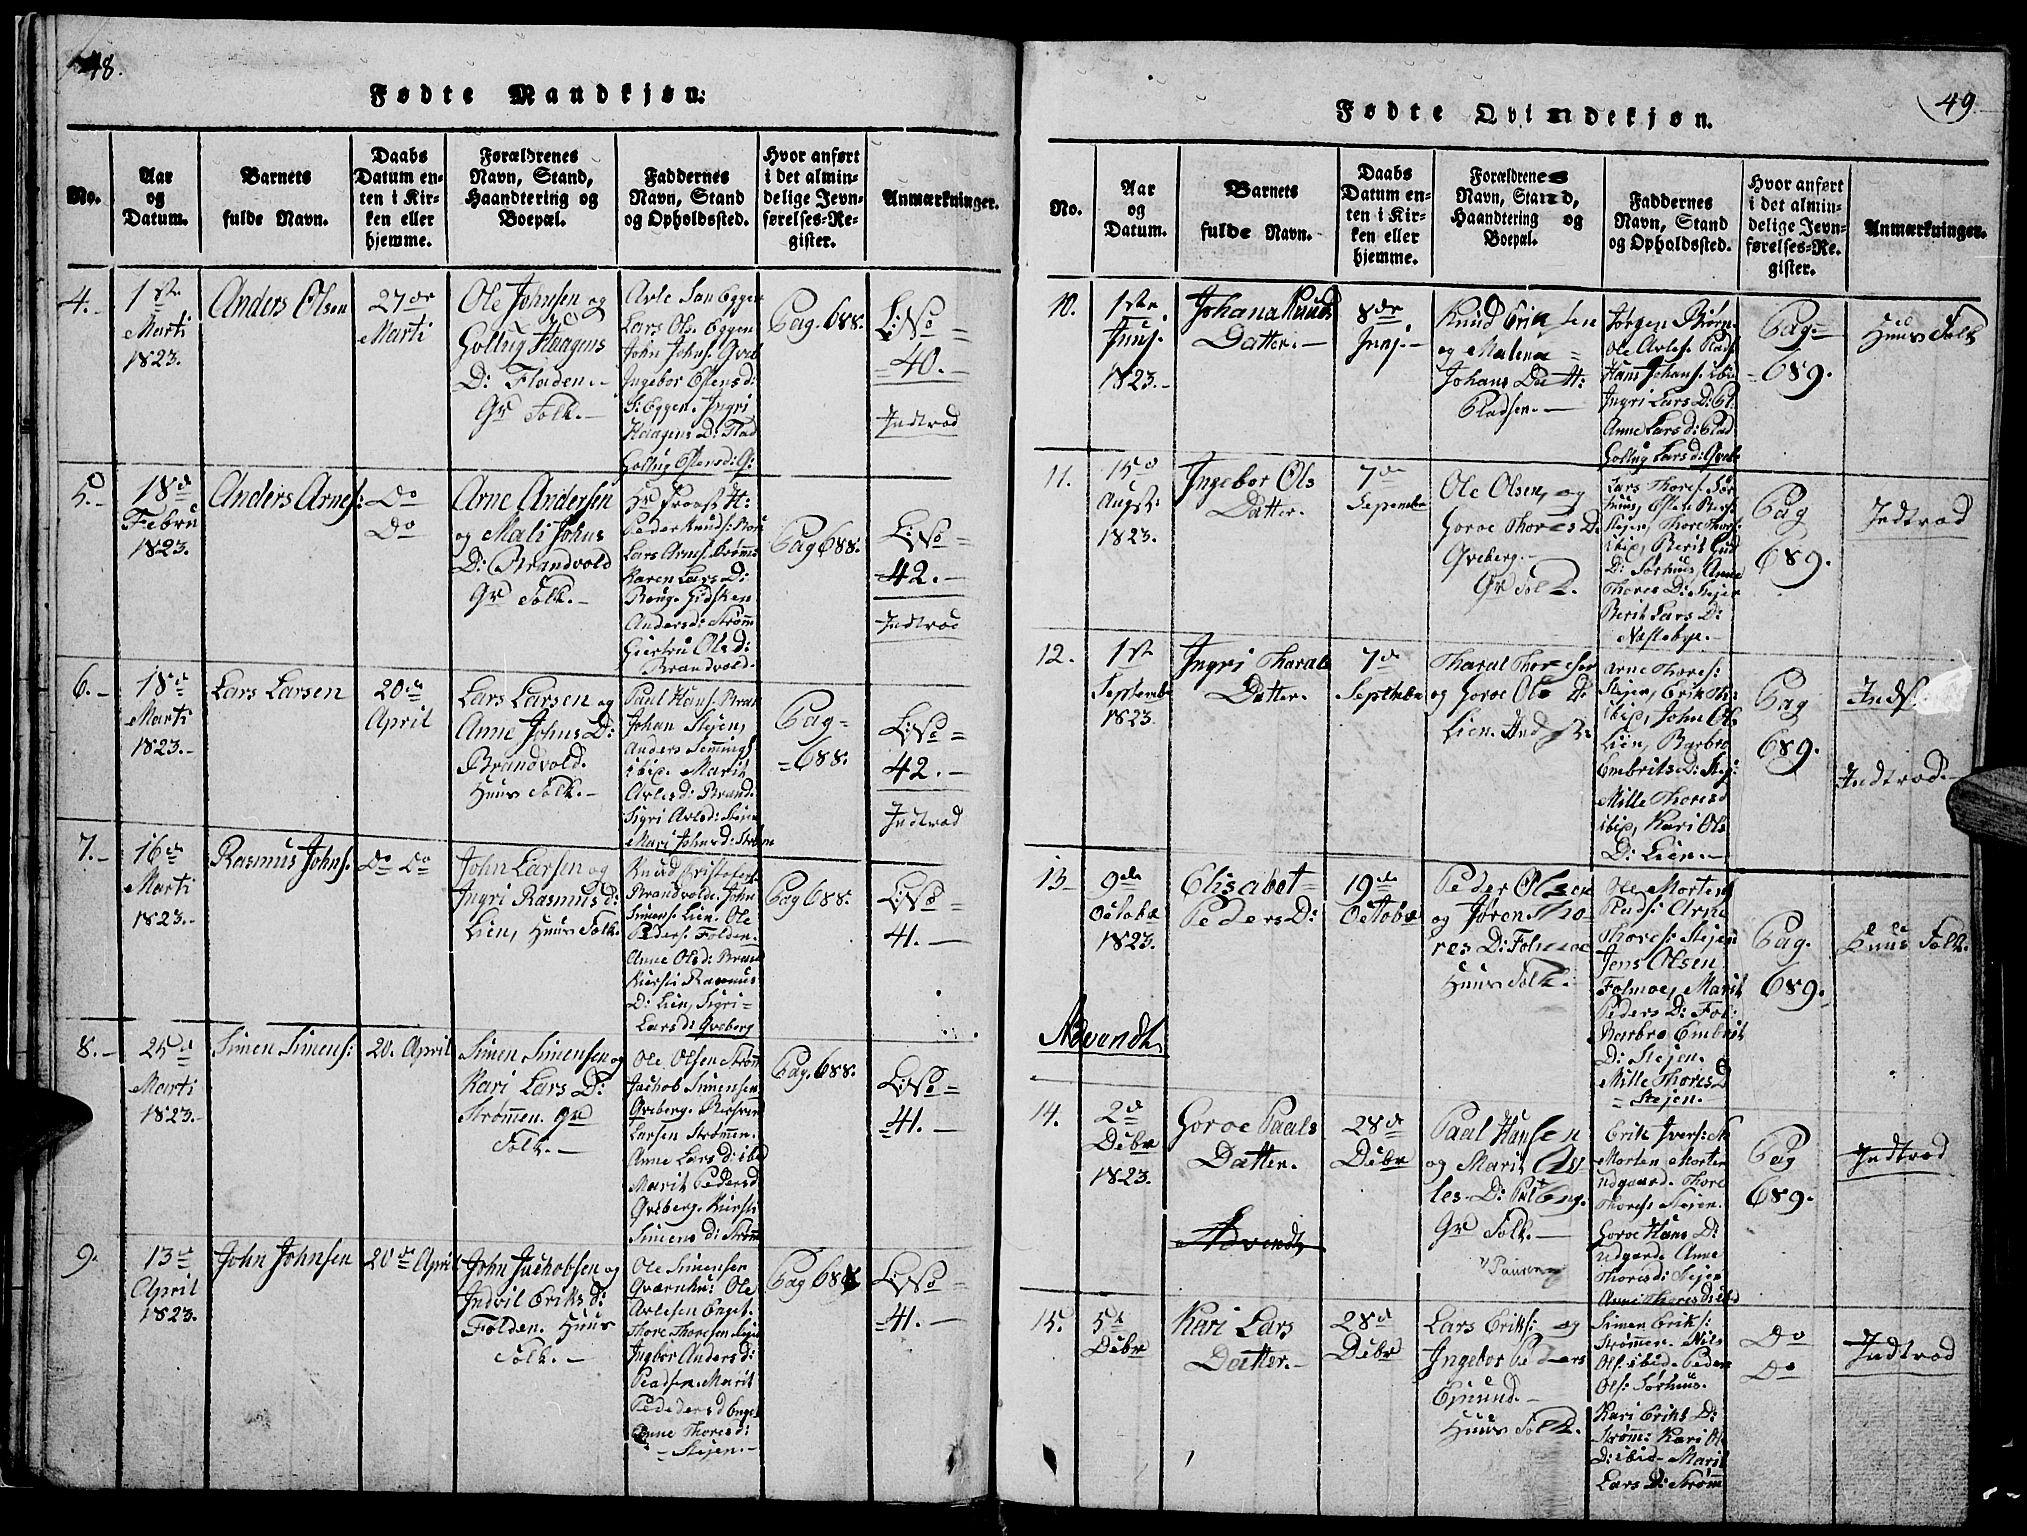 SAH, Tynset prestekontor, Klokkerbok nr. 2, 1814-1862, s. 48-49